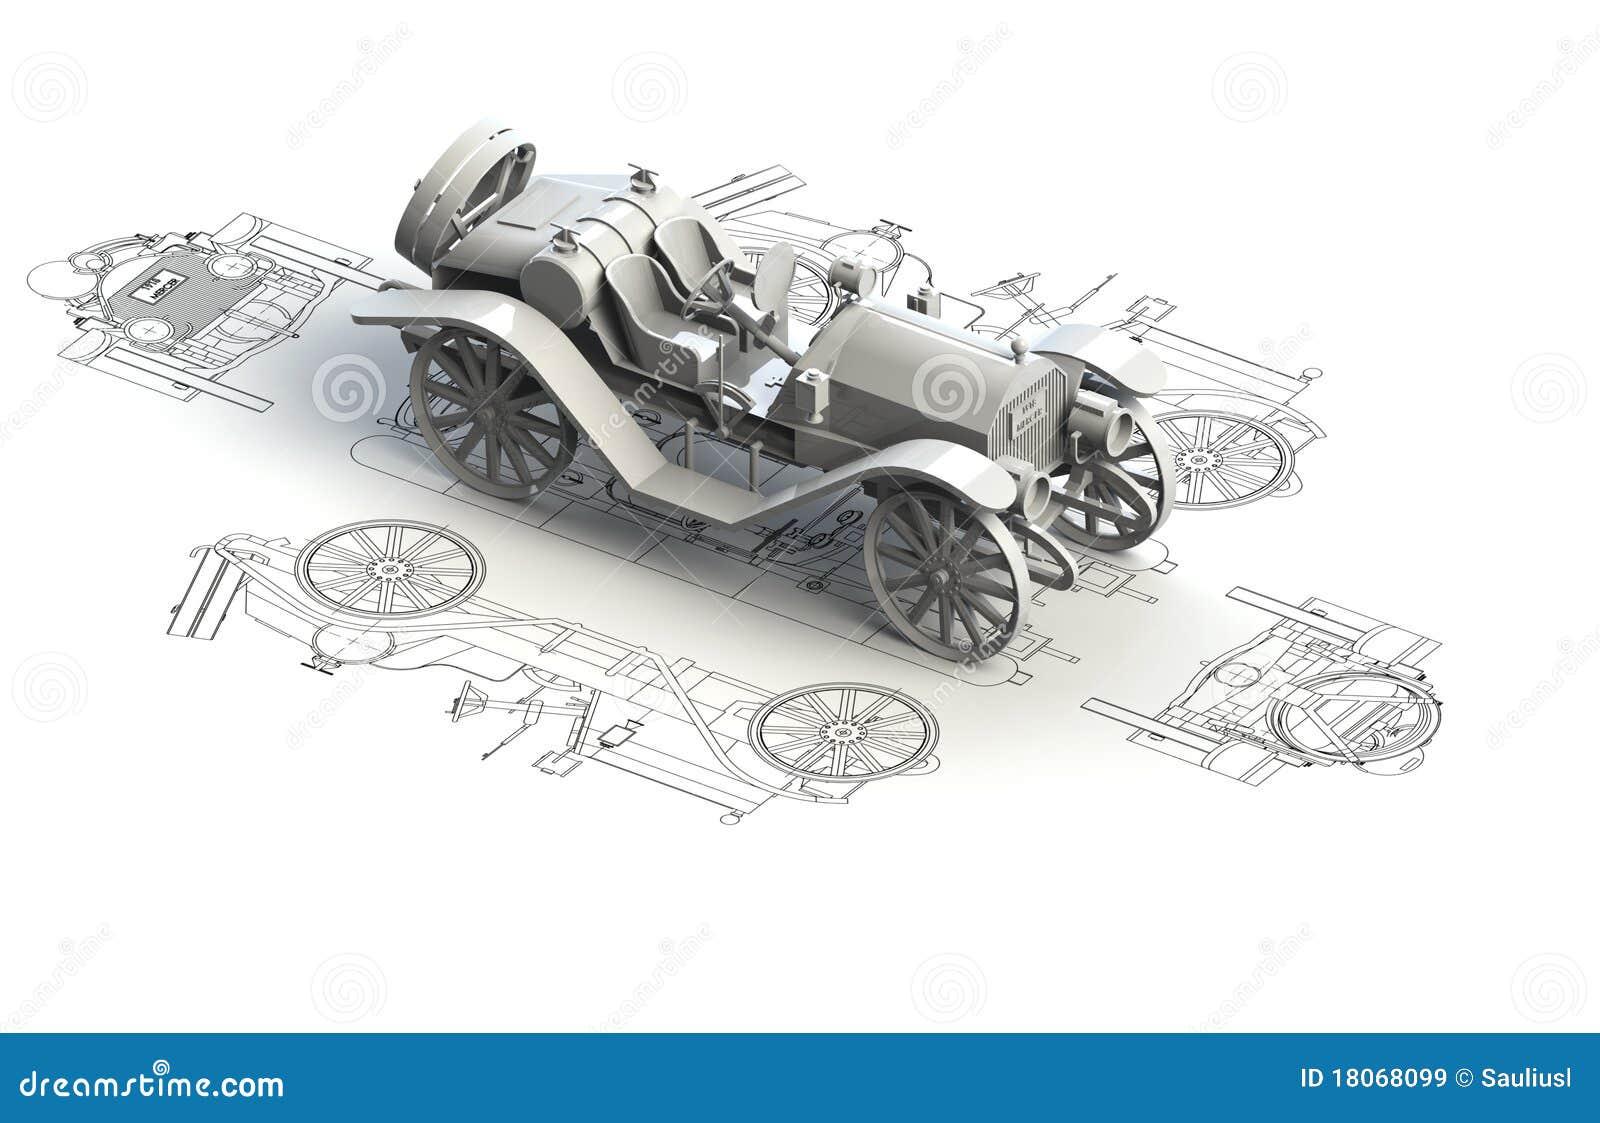 retro car charts with 3d model stock illustration. Black Bedroom Furniture Sets. Home Design Ideas